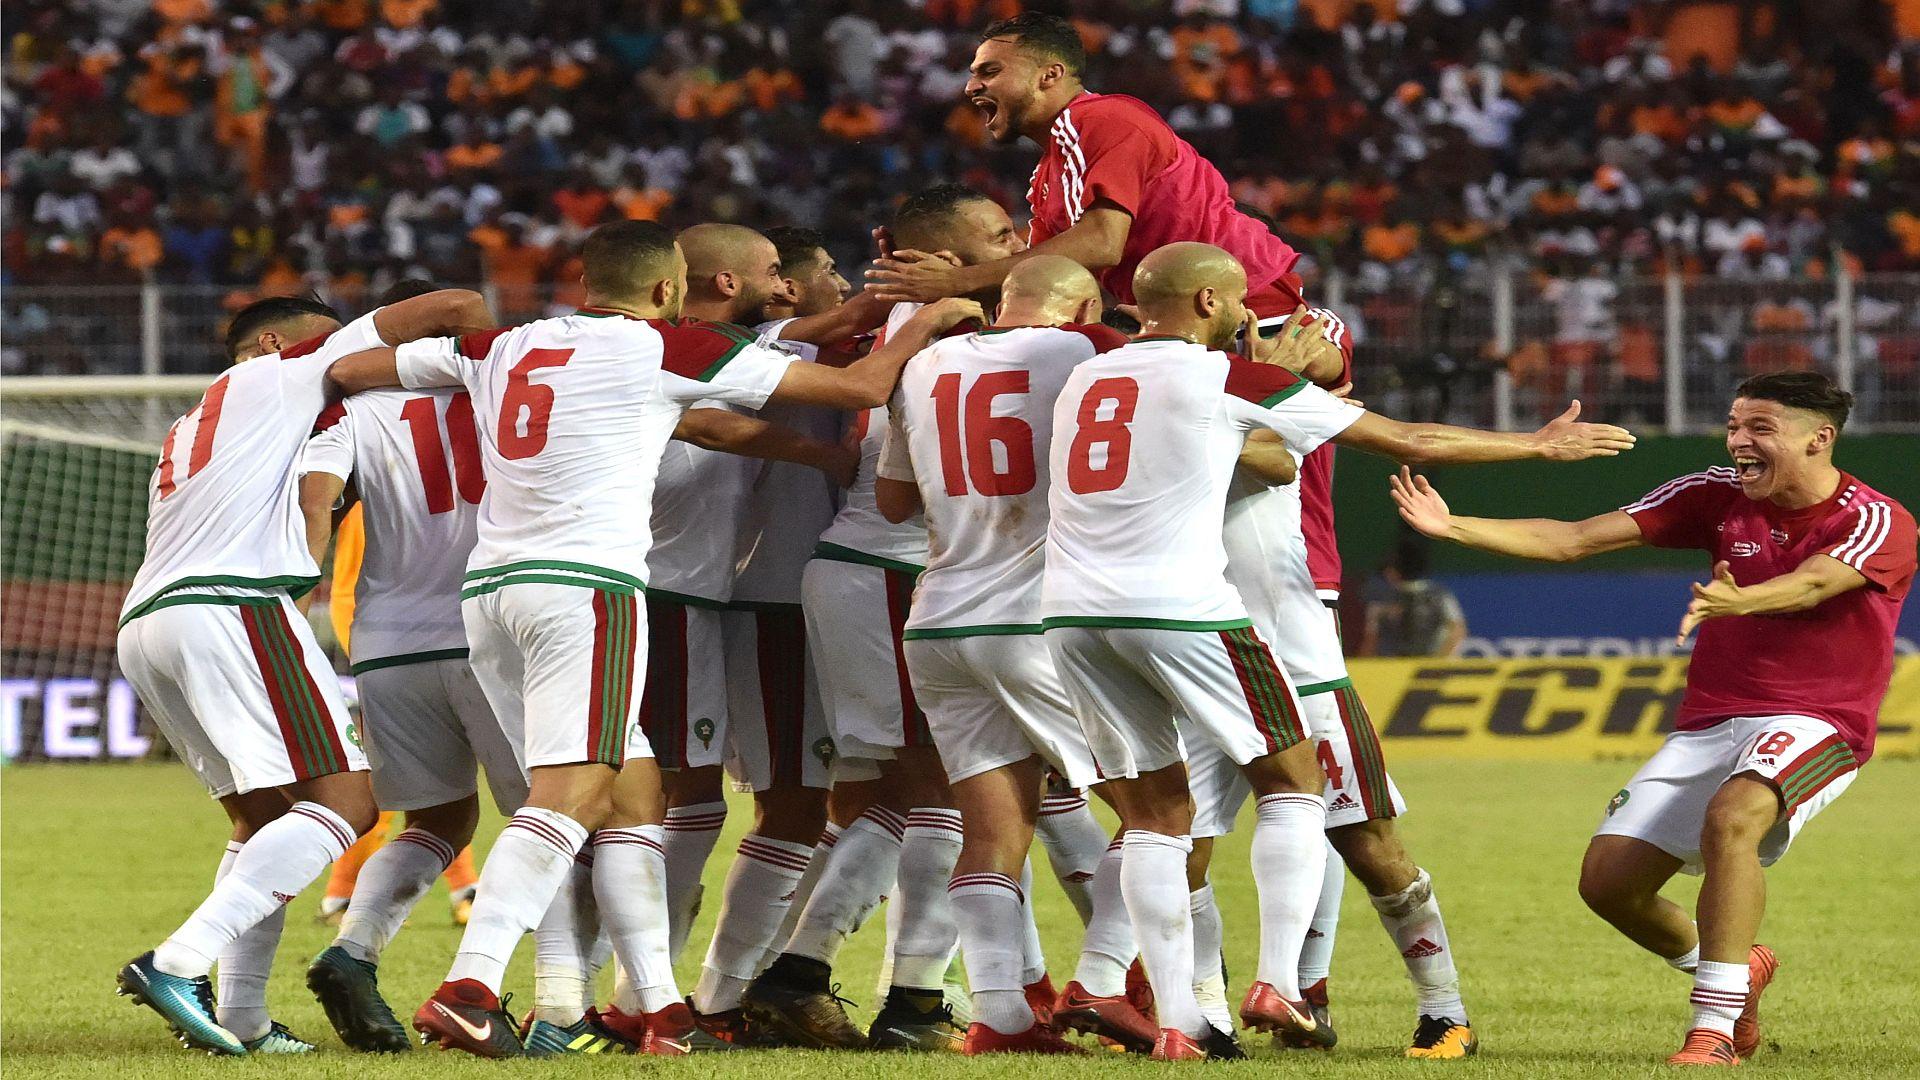 Leading Morocco to Russia 2018 'my most beautiful moment' - Benatia